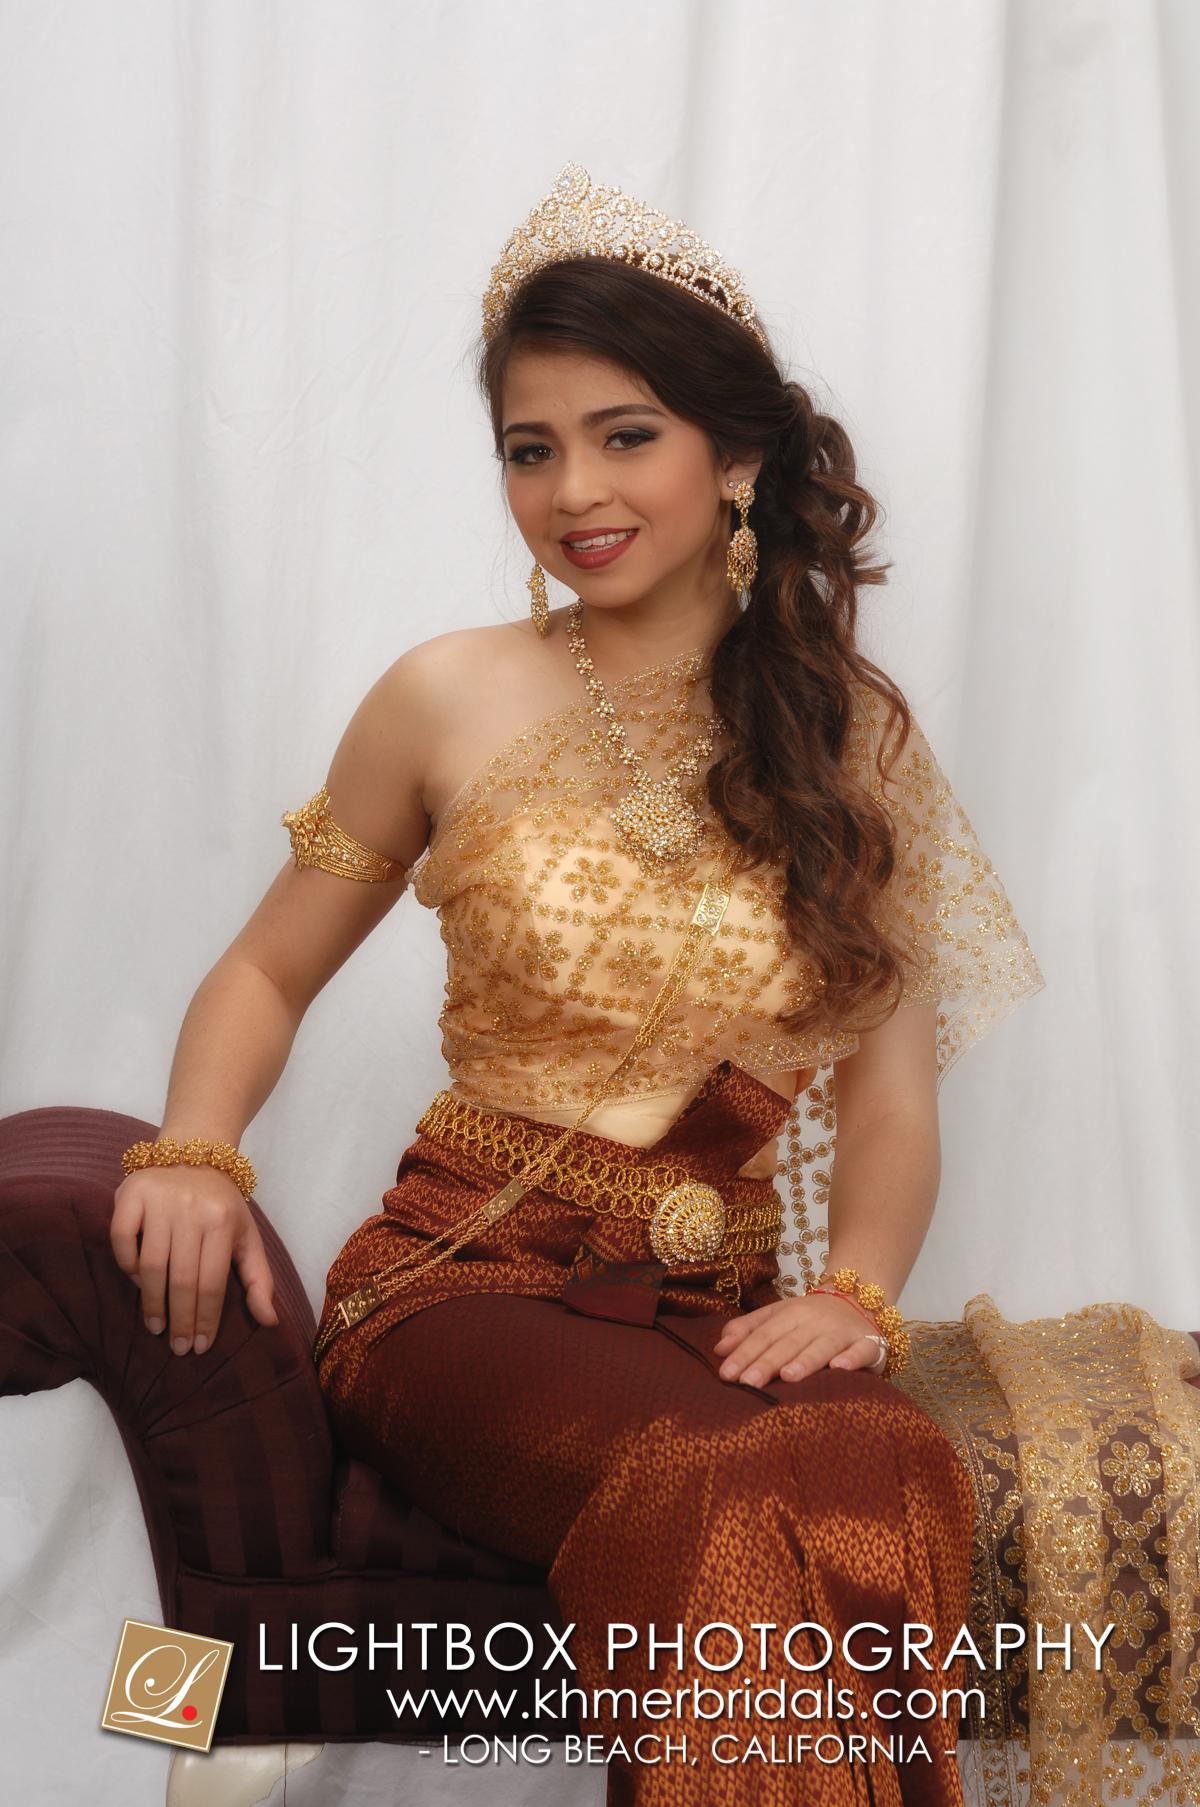 Apsara Khmer Bridal Wedding Photography and video-214.jpg